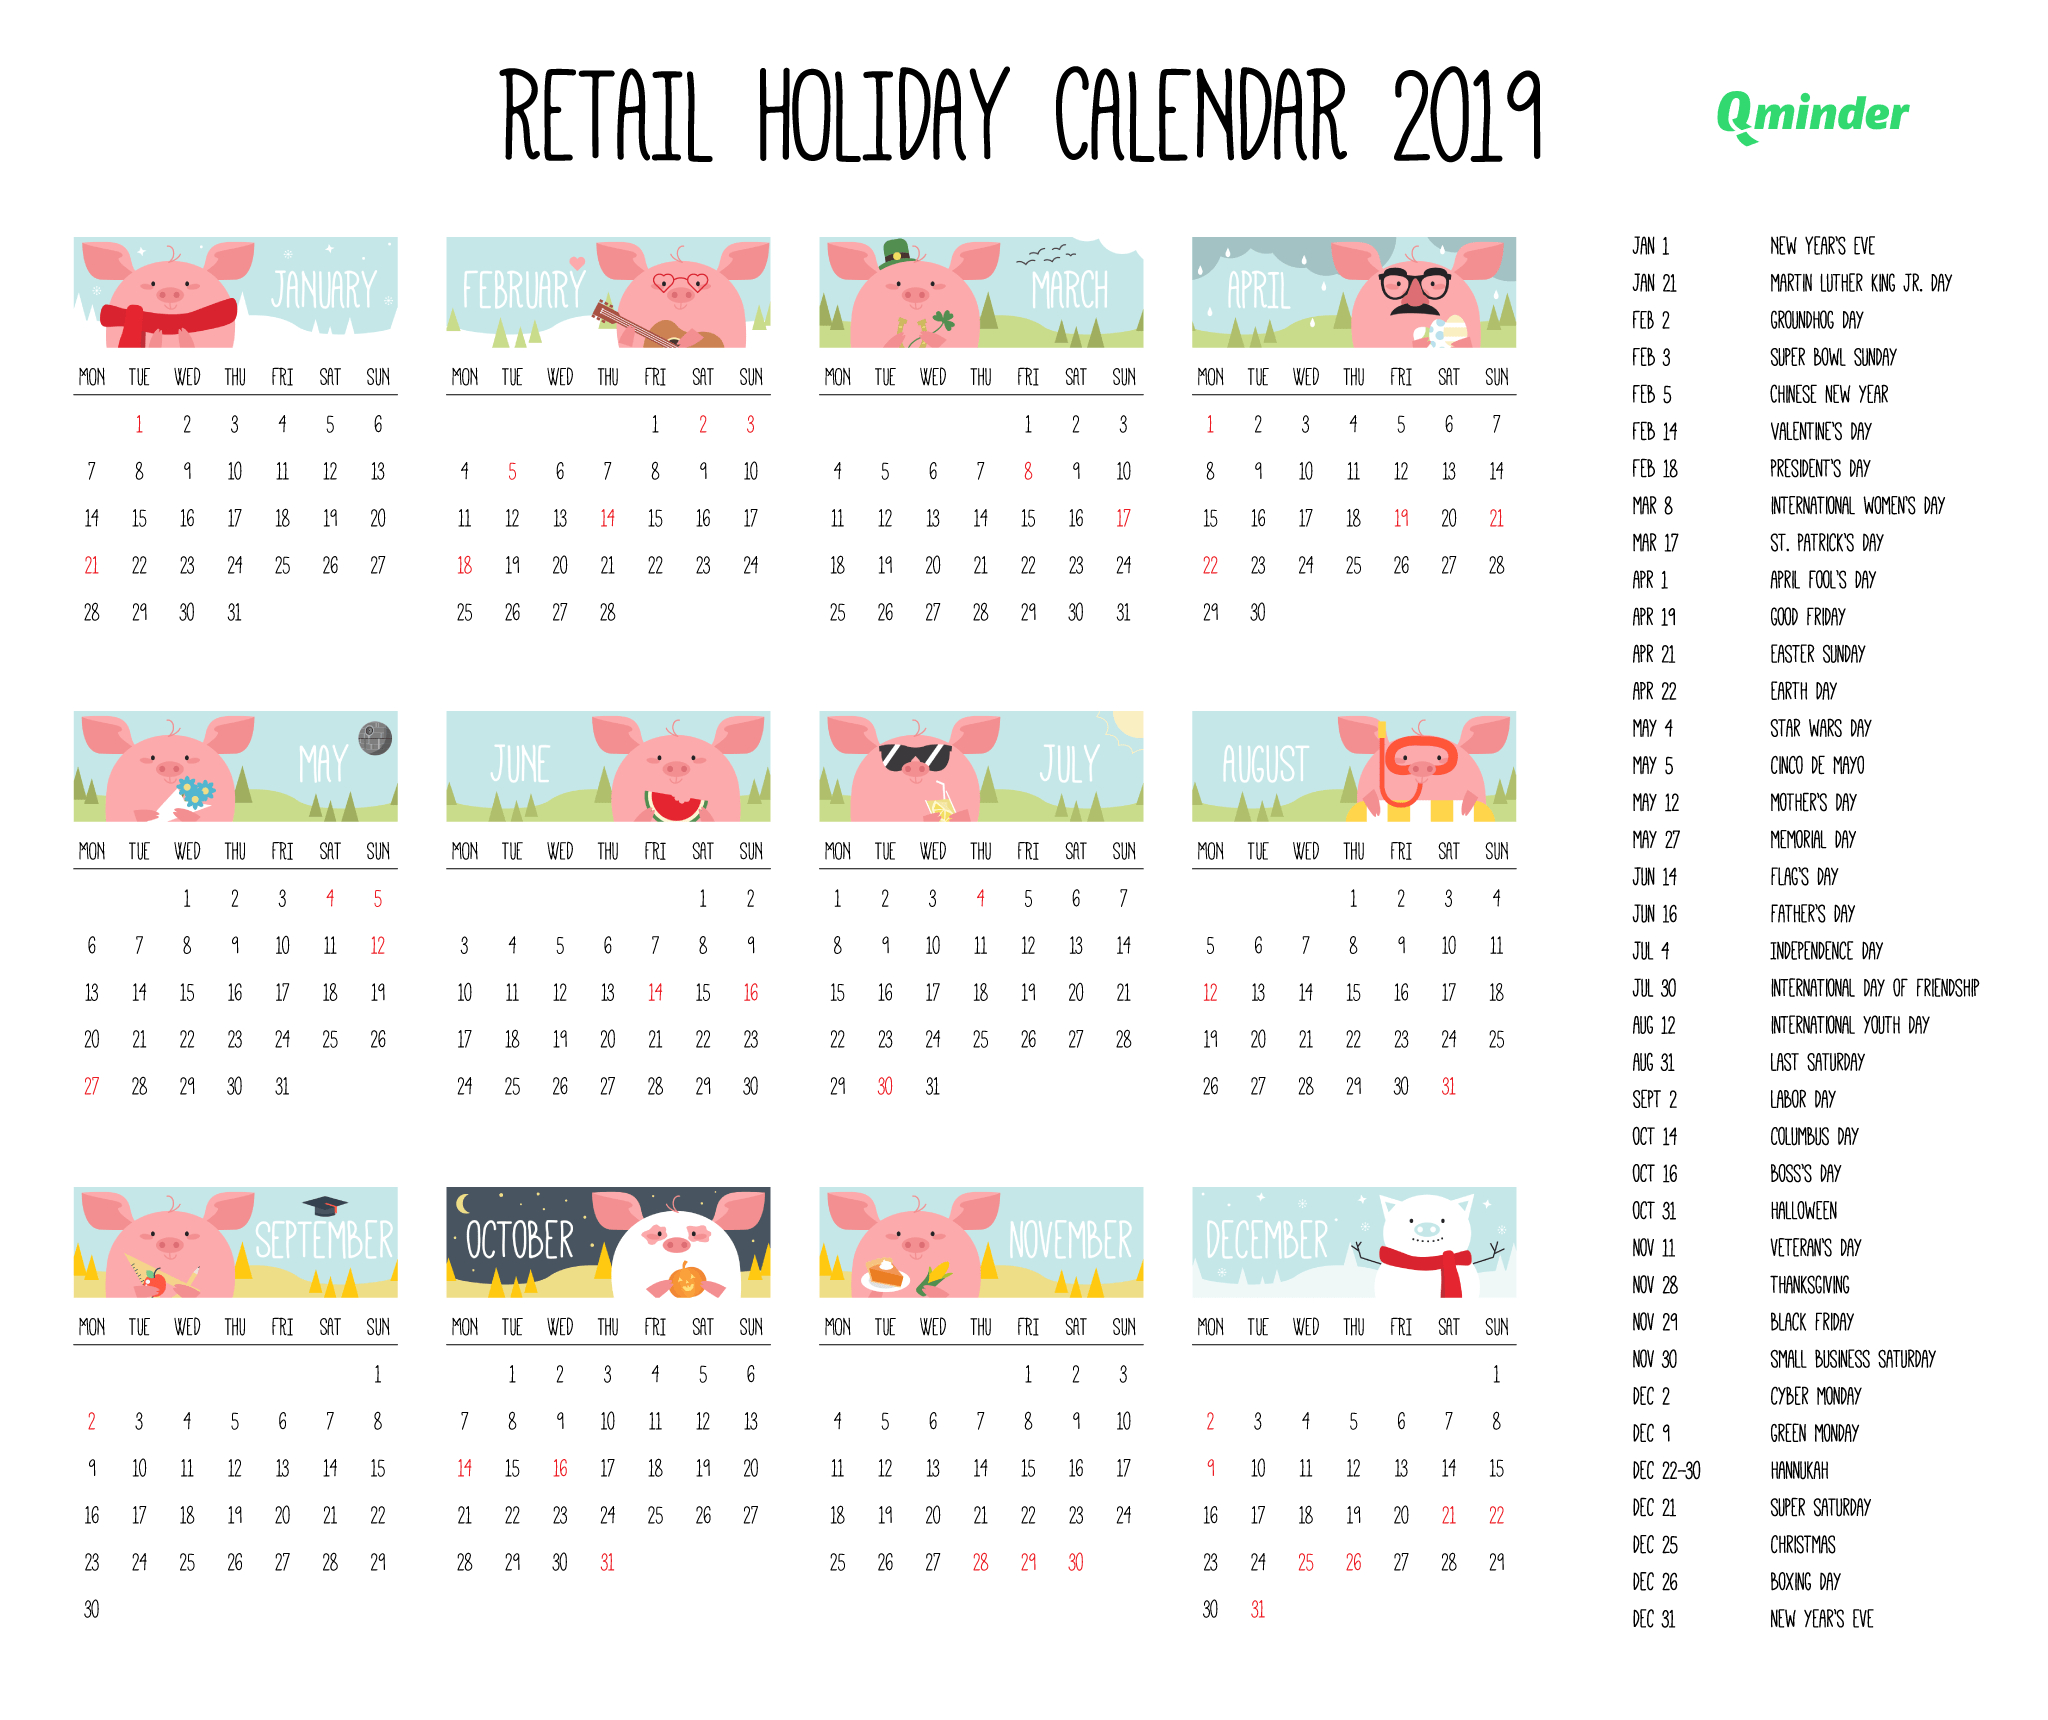 2019 Retail Holiday Calendar   Qminder Calendar 2019 Holidays